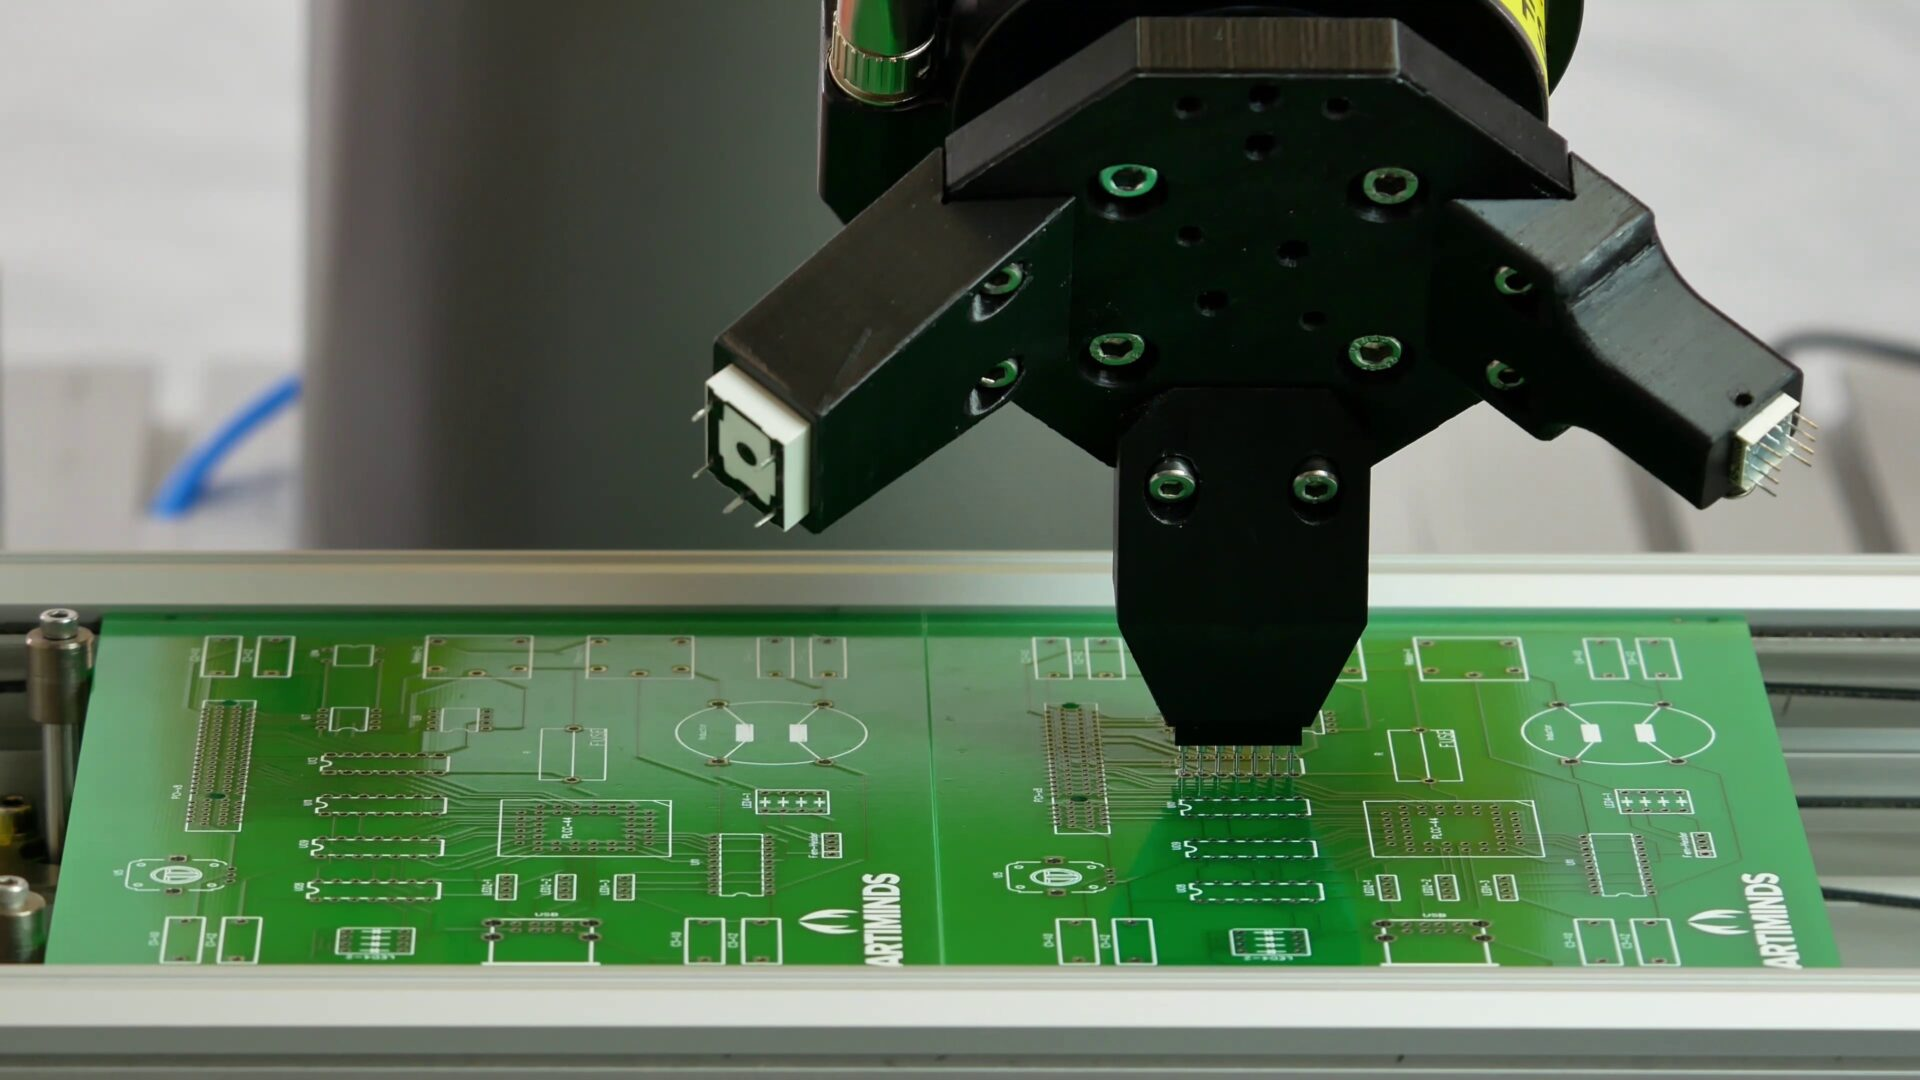 ArtiMinds Robotics – Sensorbasierte Roboterprogramme mit Bilderverarbeitung oder Kraftsensoren